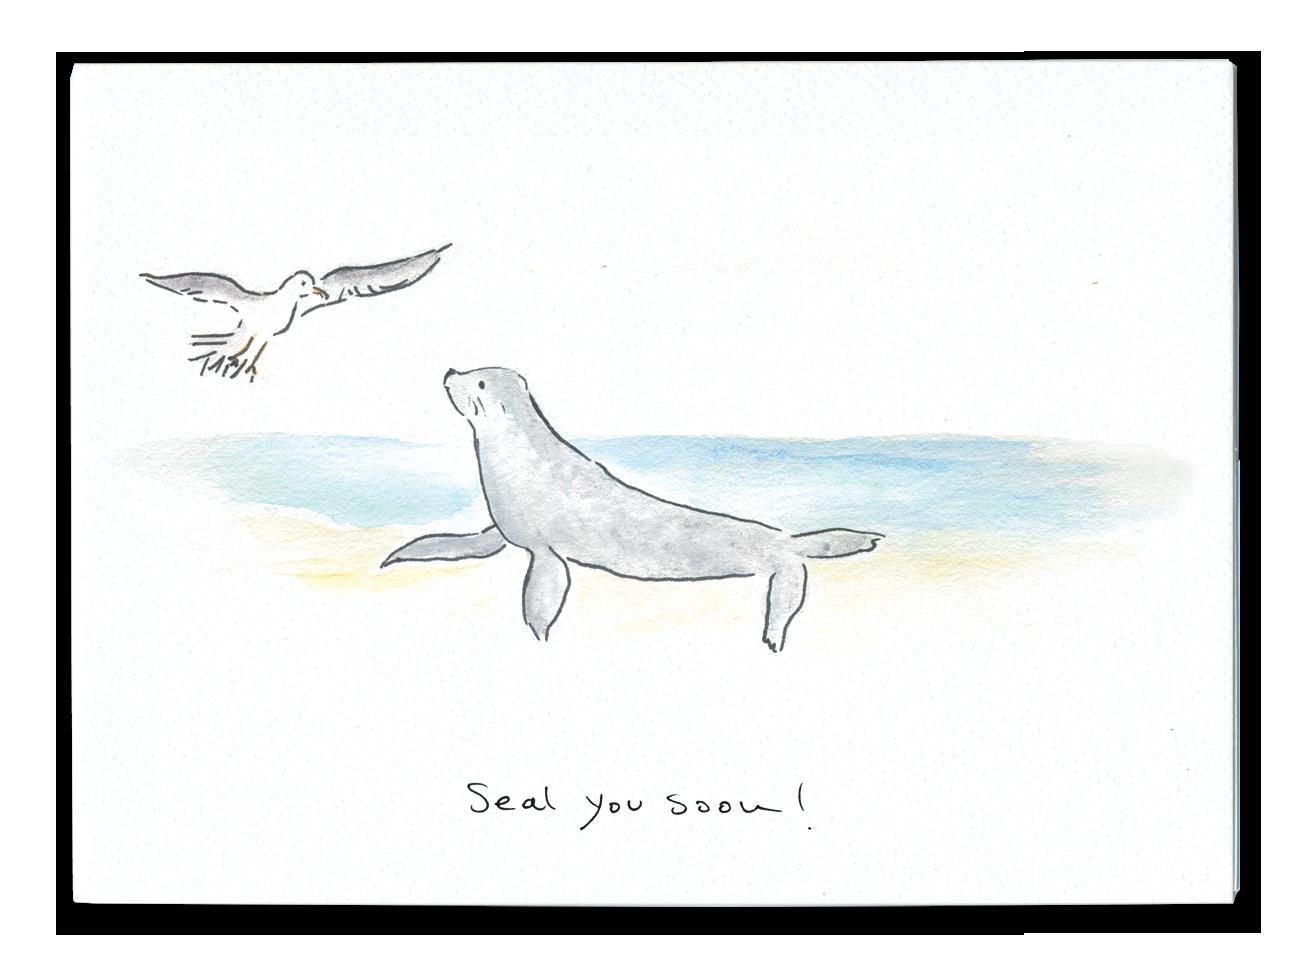 Seal You Soon